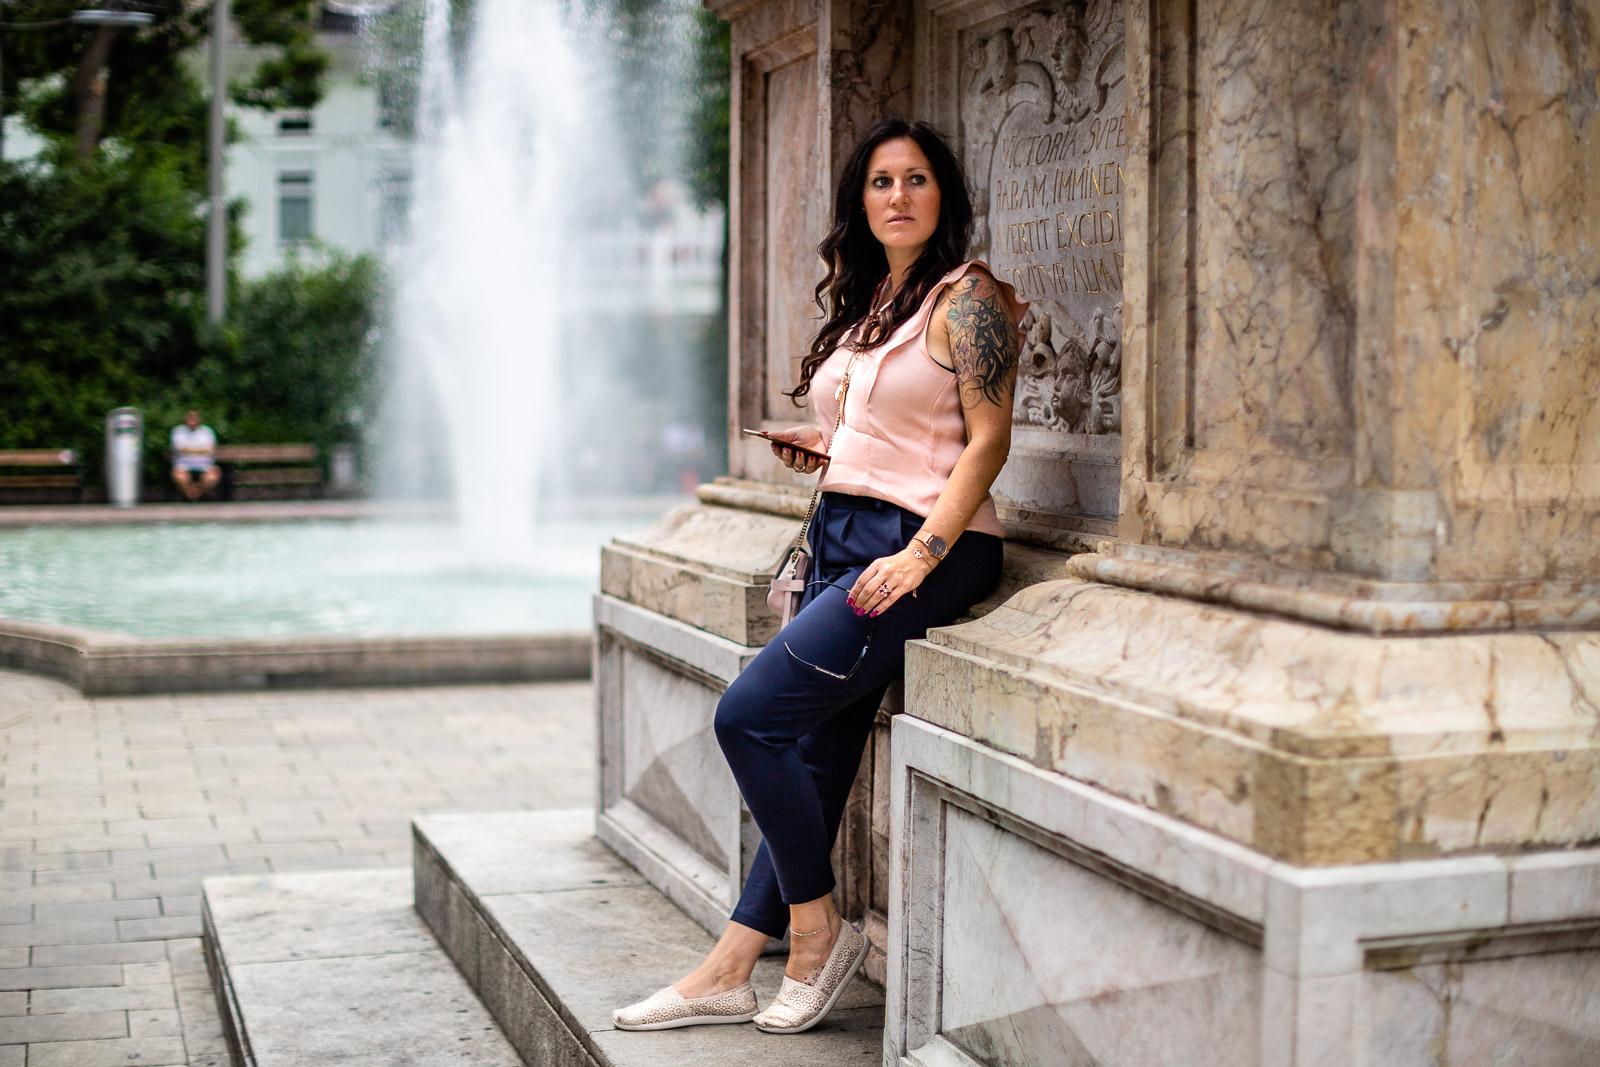 Miss Classy am Eisernen Tor in Graz